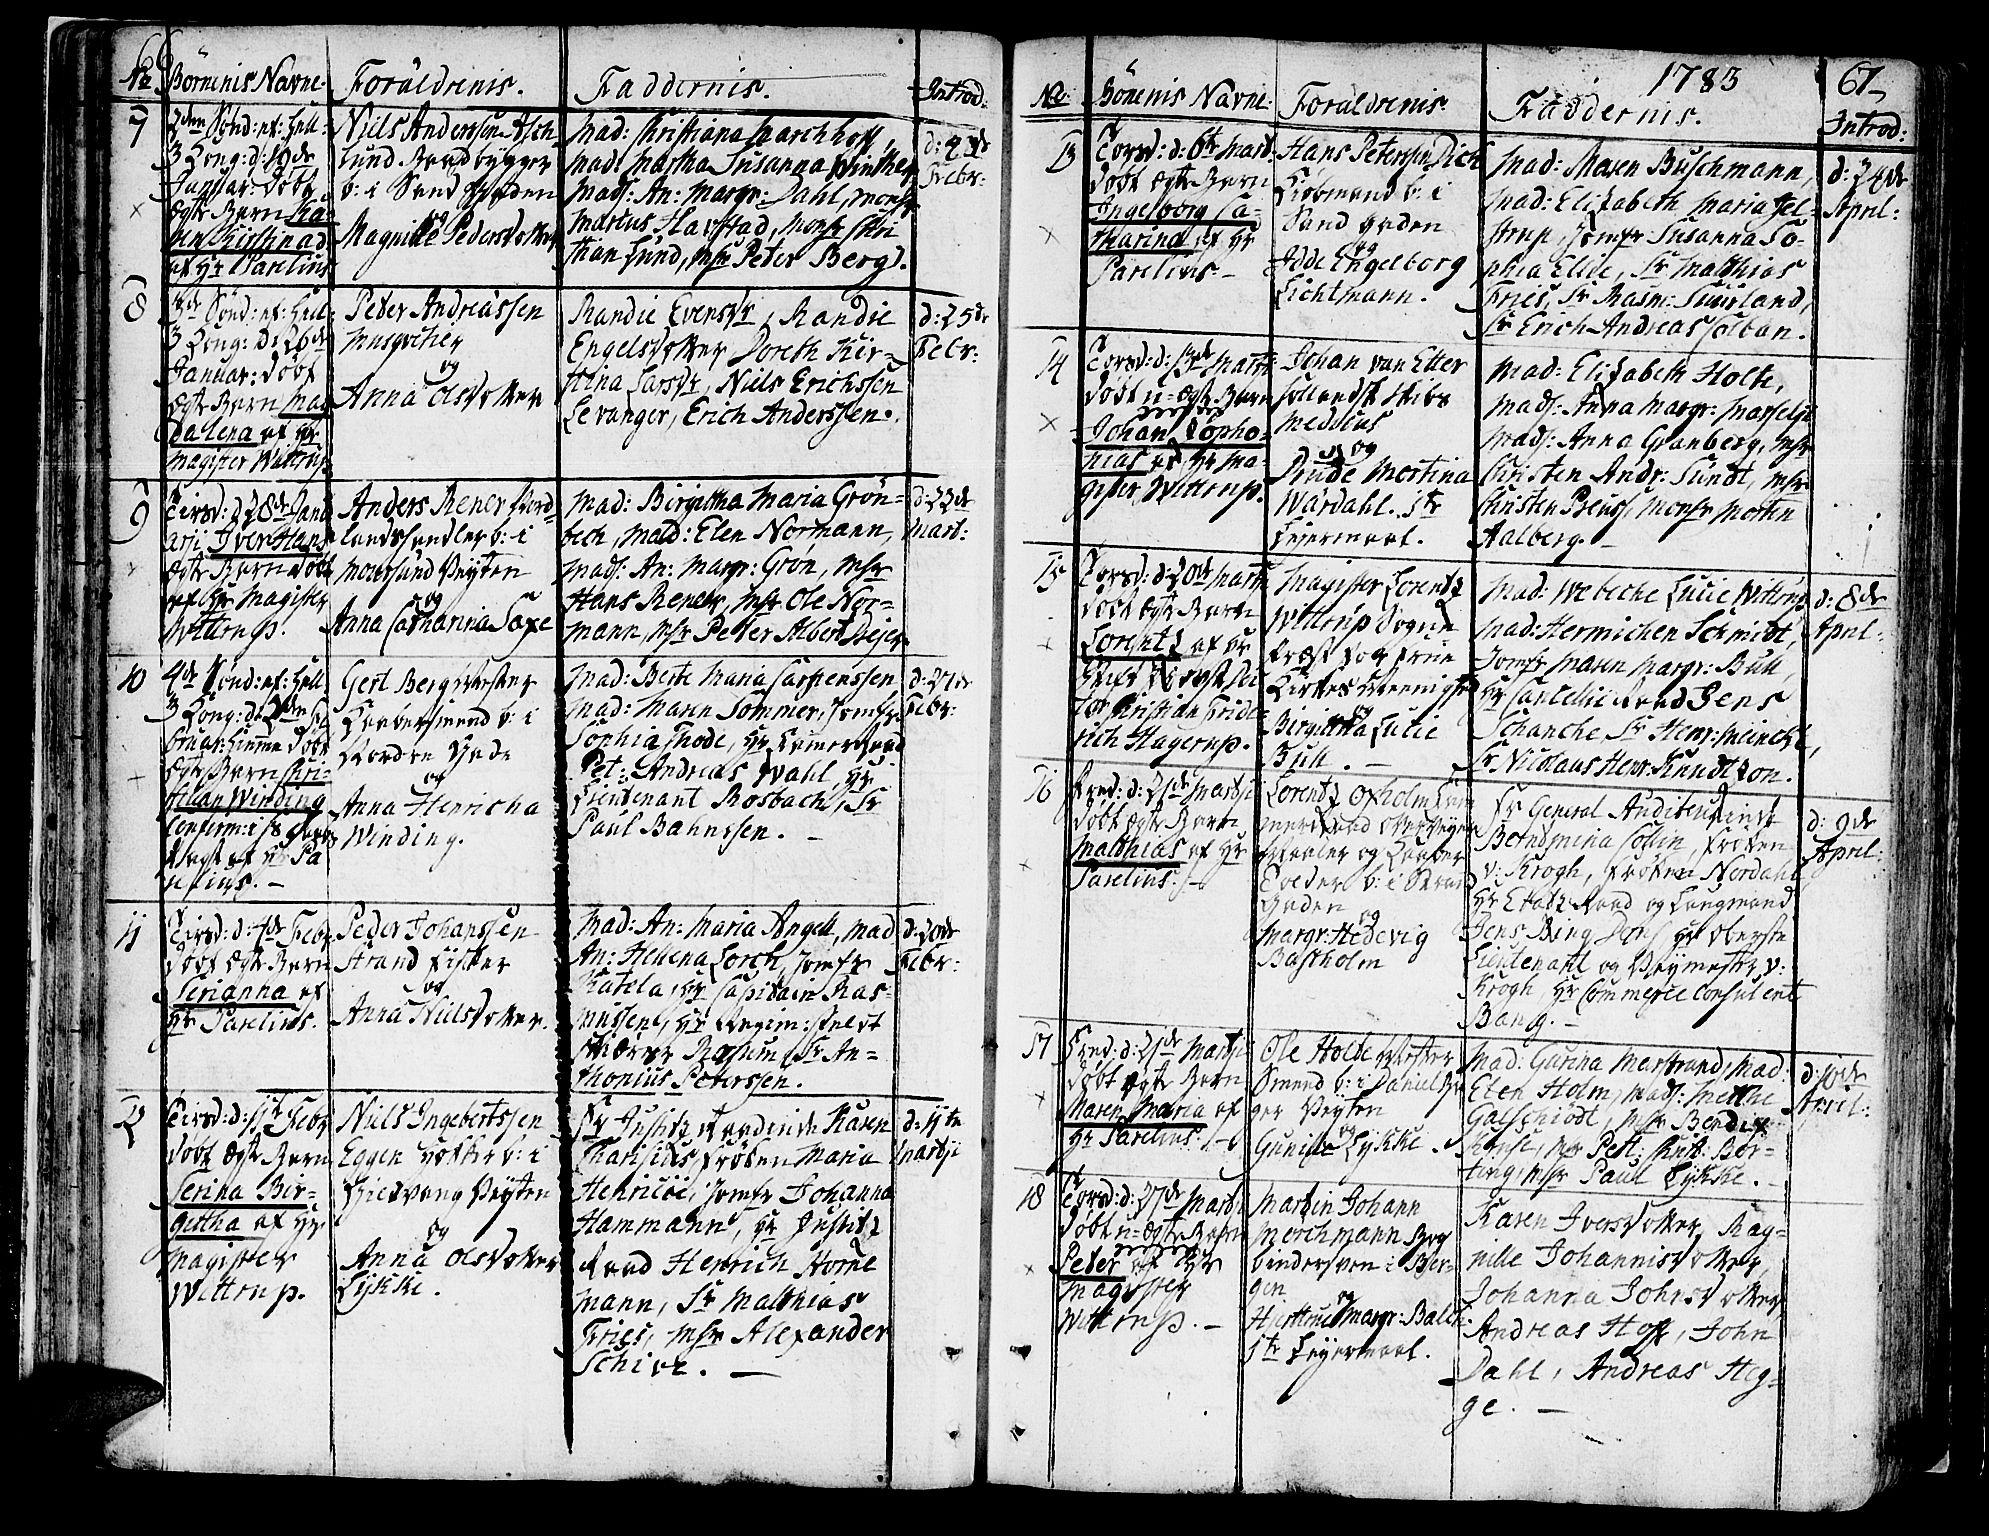 SAT, Ministerialprotokoller, klokkerbøker og fødselsregistre - Sør-Trøndelag, 602/L0104: Parish register (official) no. 602A02, 1774-1814, p. 66-67